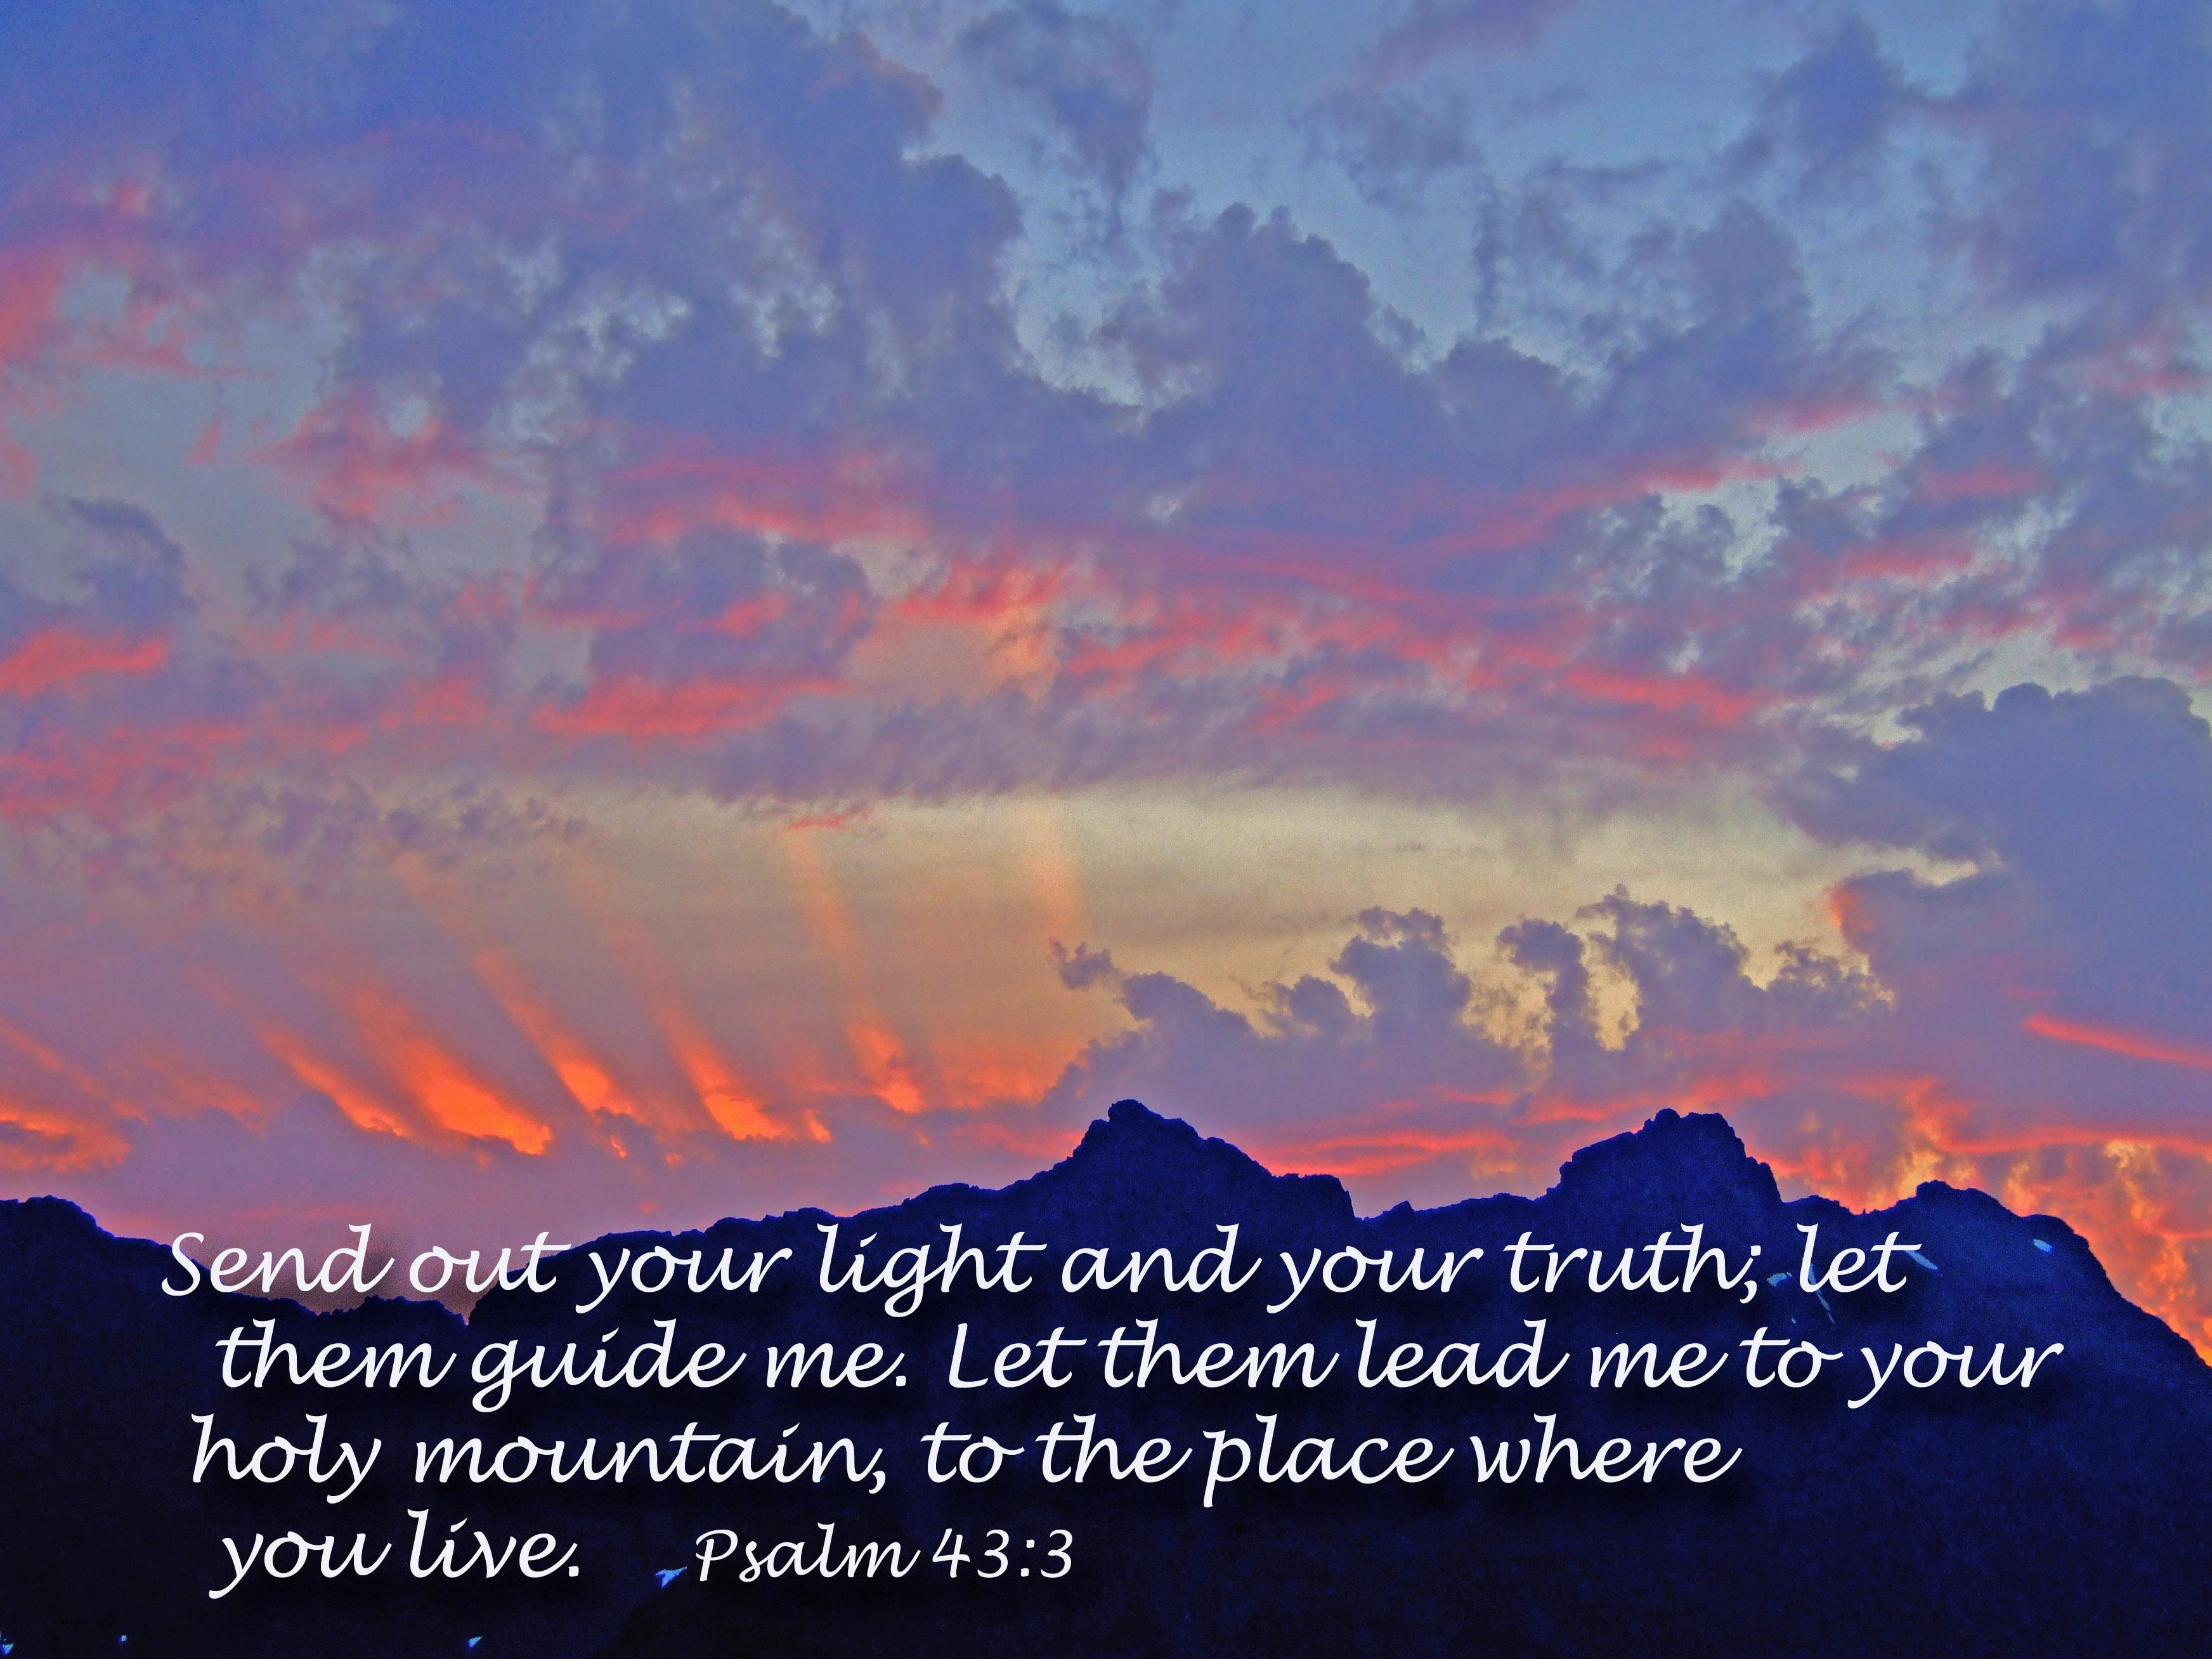 Psalm 43 3